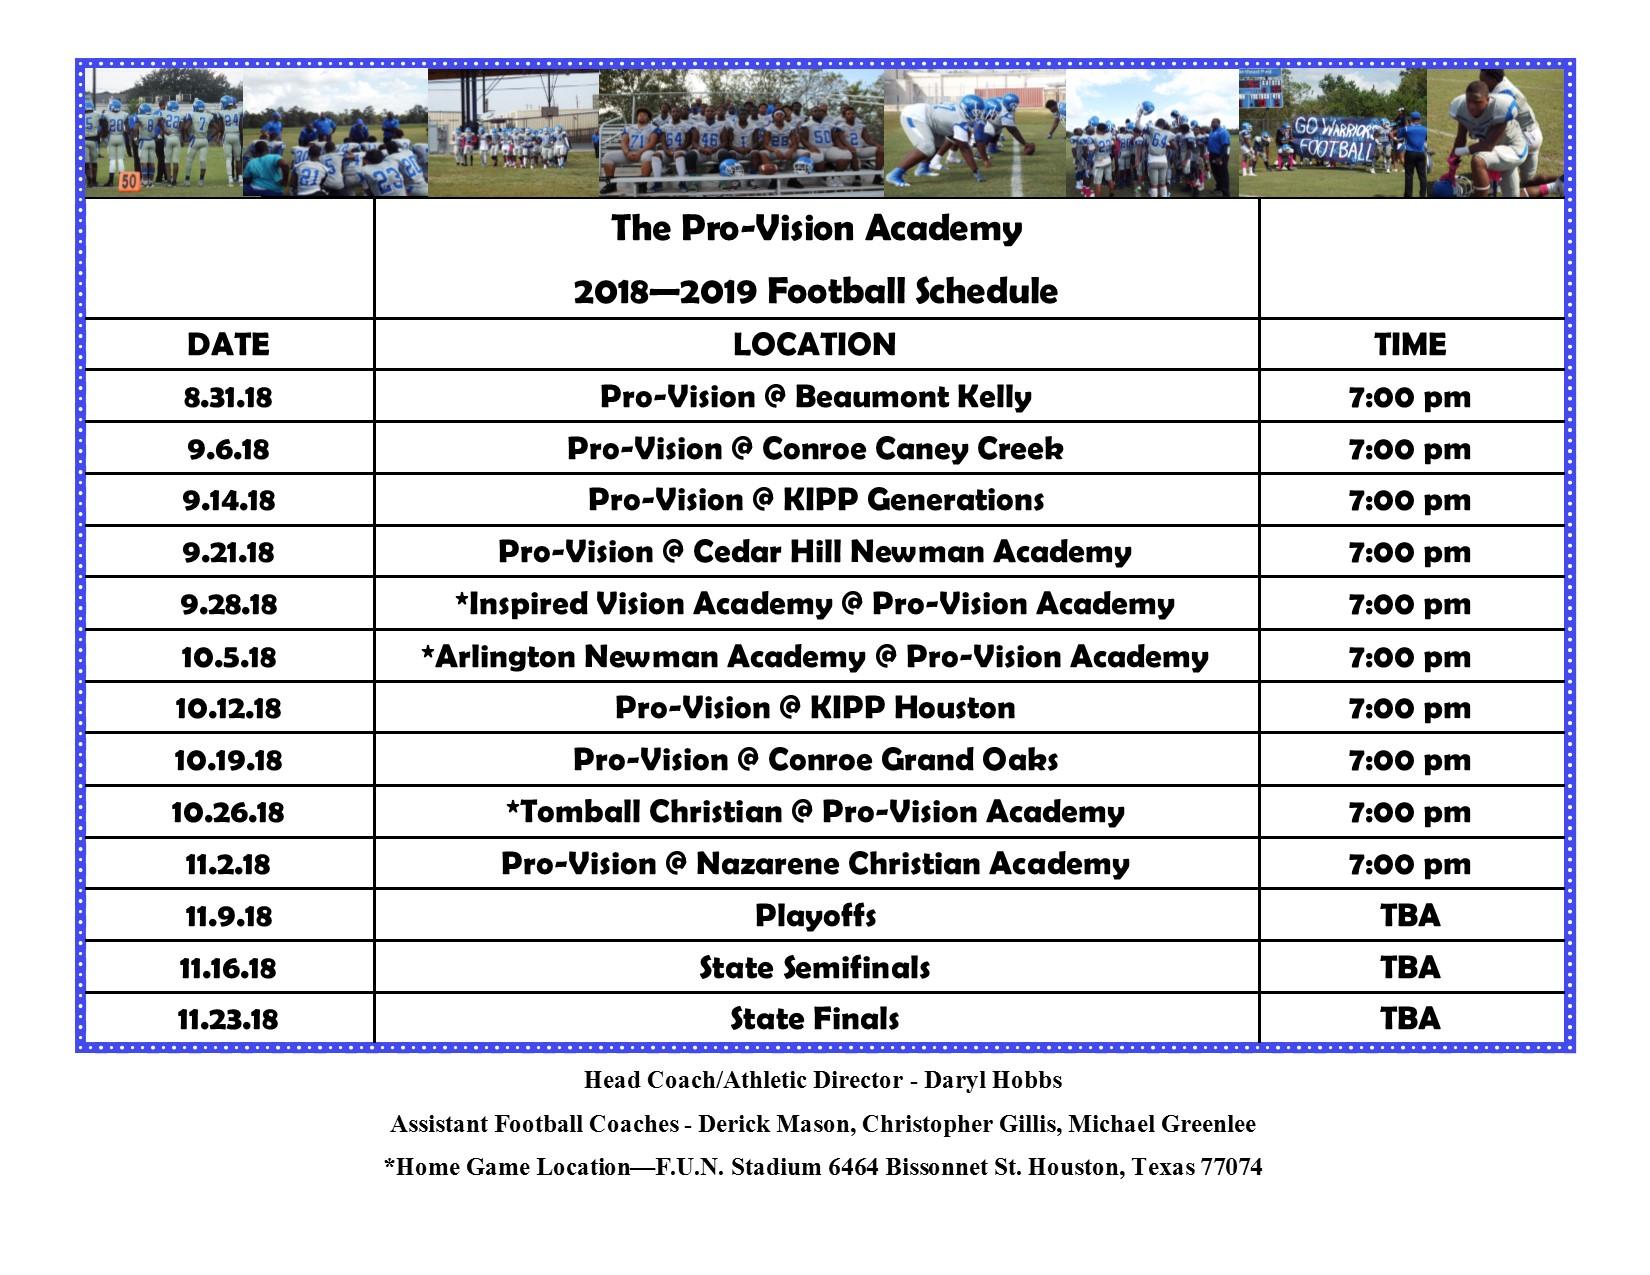 2018 - 2019 football schedule